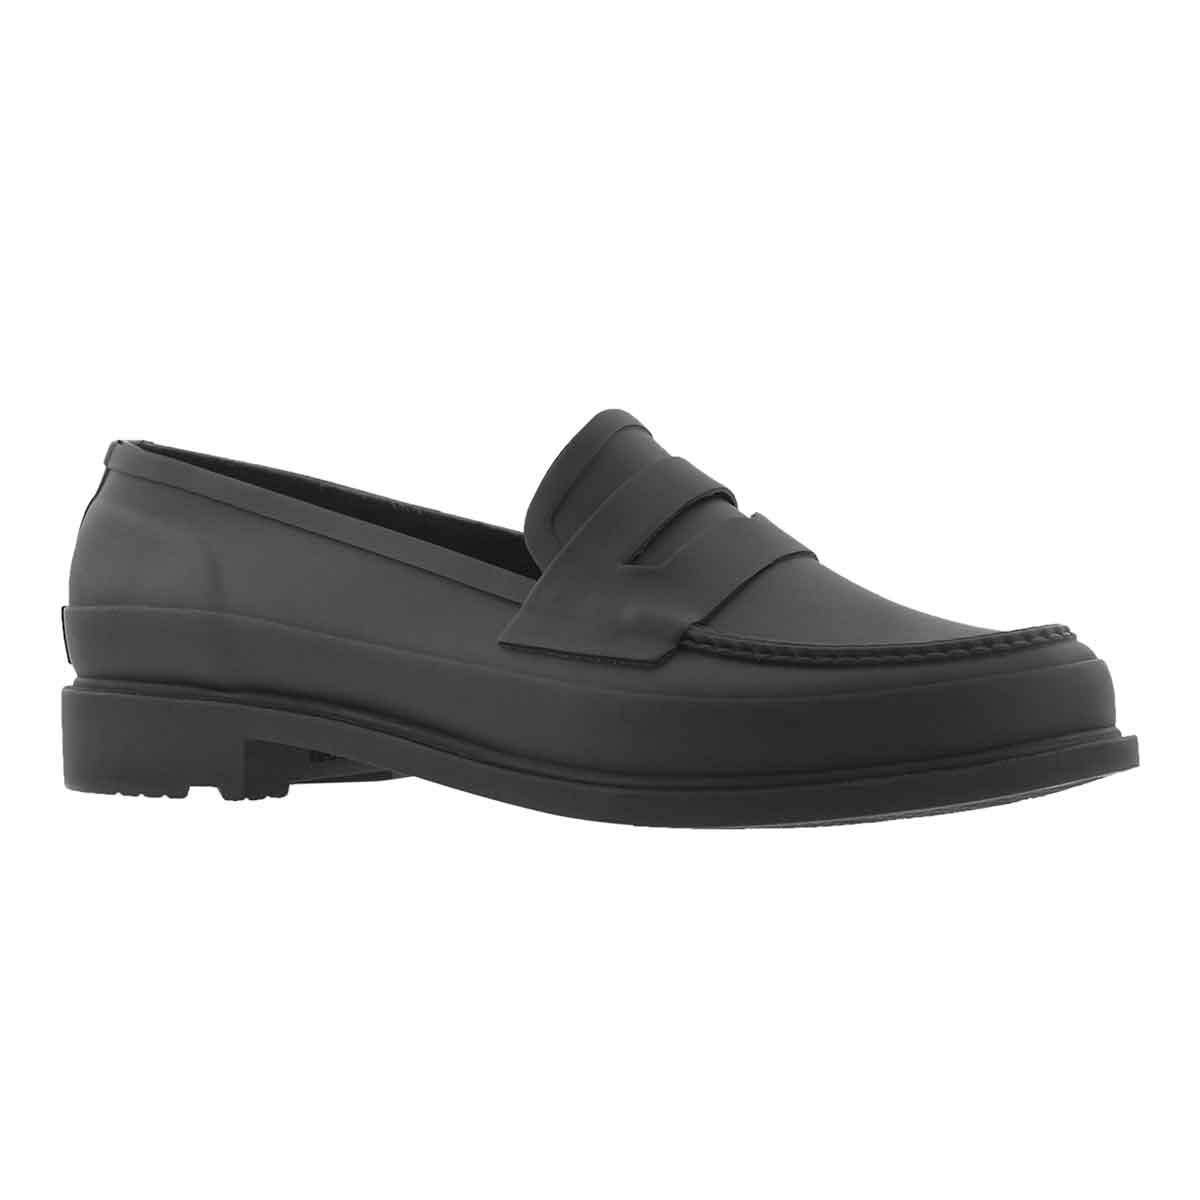 Women's REFINED LOAFER MATTE black shoes